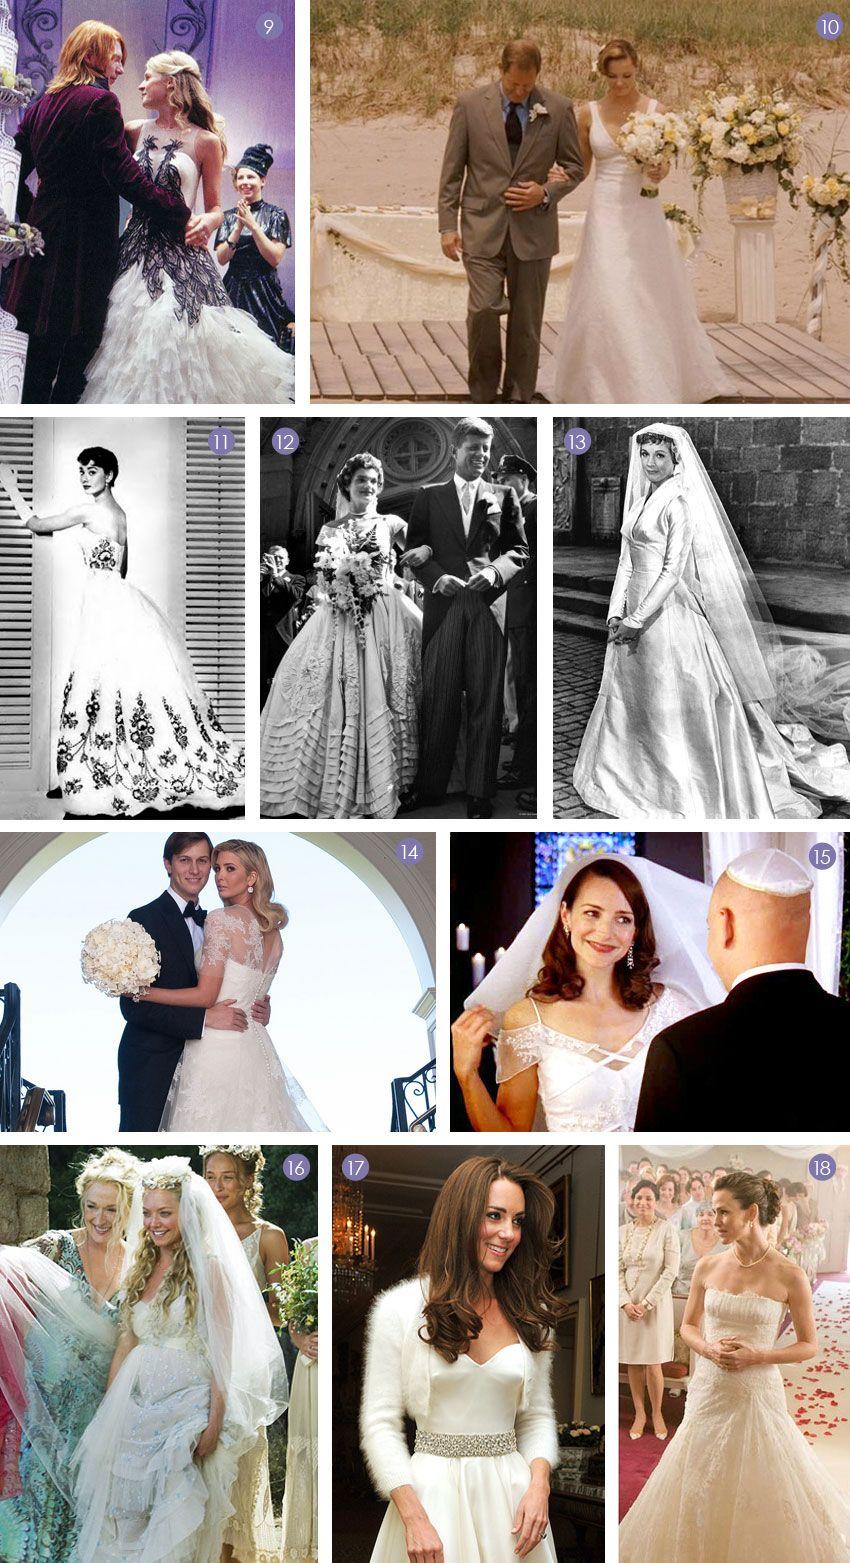 Famous wedding dresses  dresses  Weddings  Pinterest  Iconic dresses Famous wedding